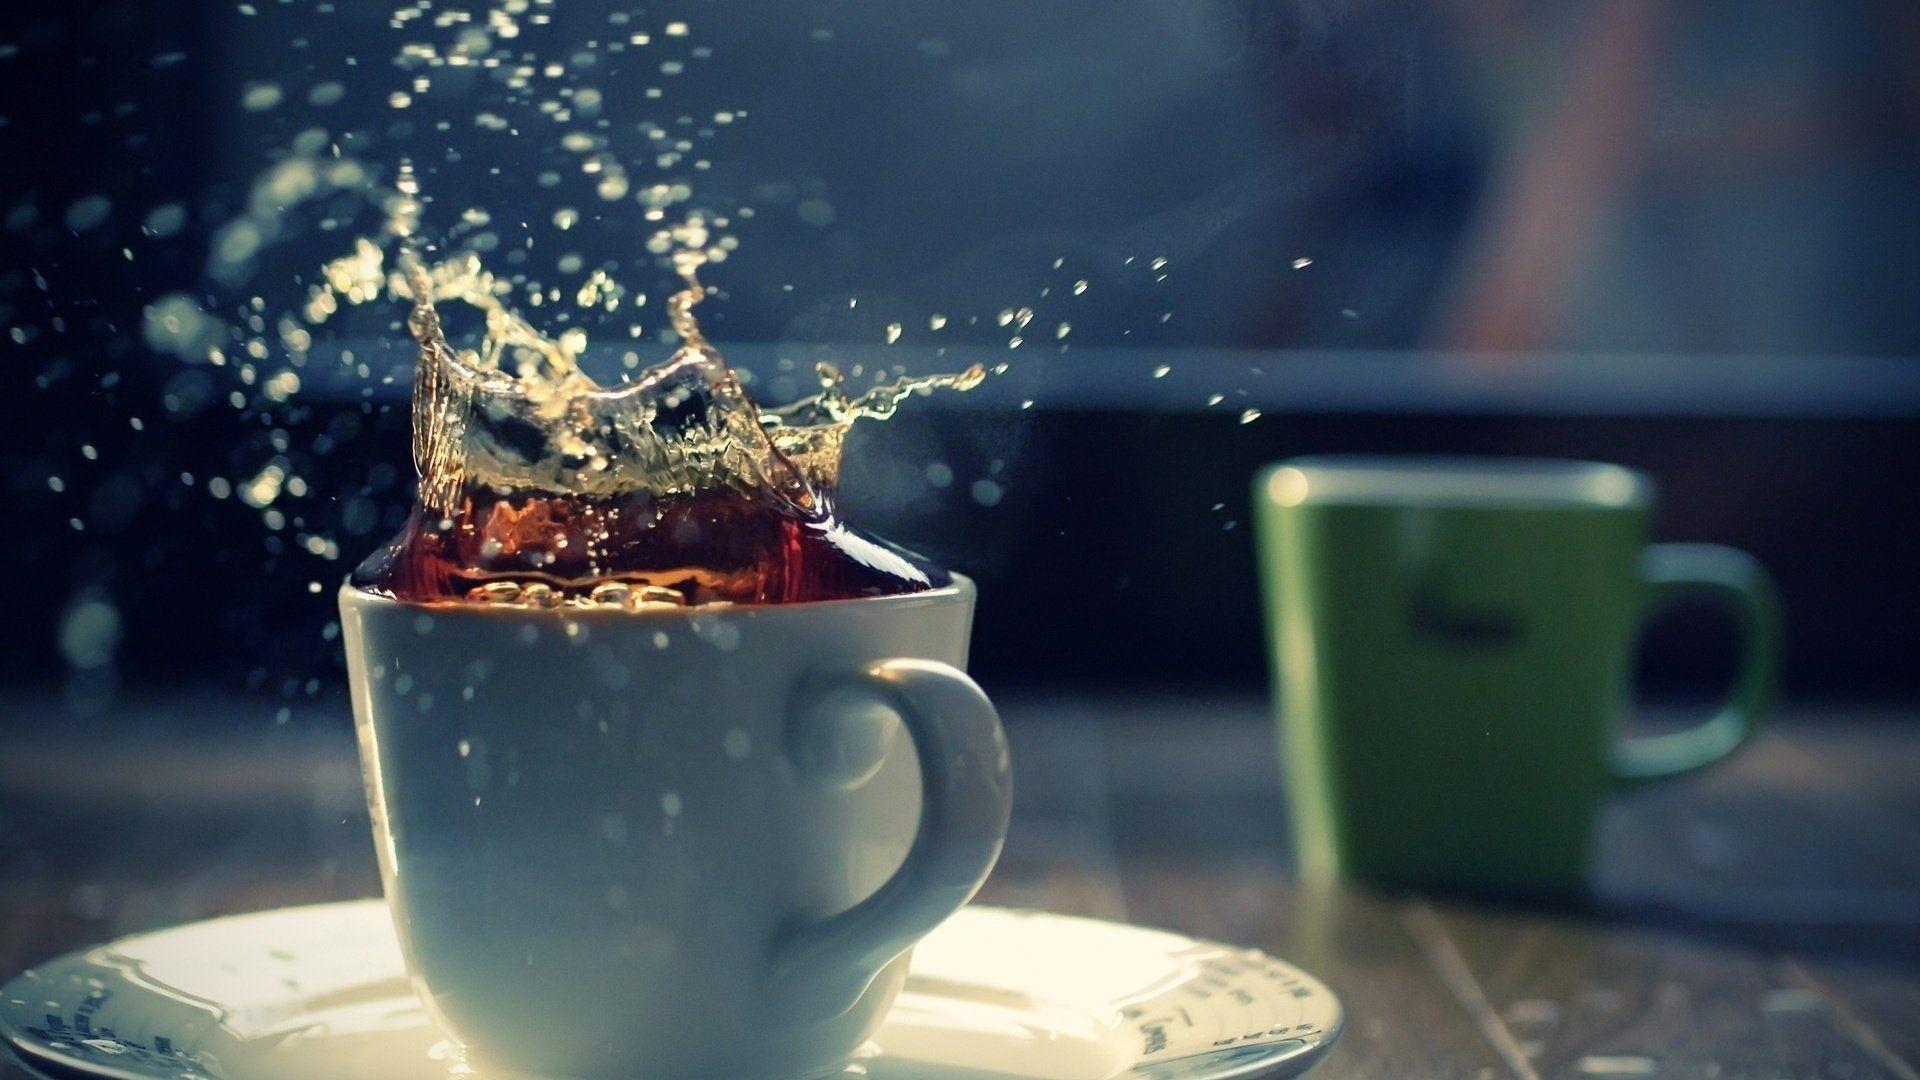 Tea hd image